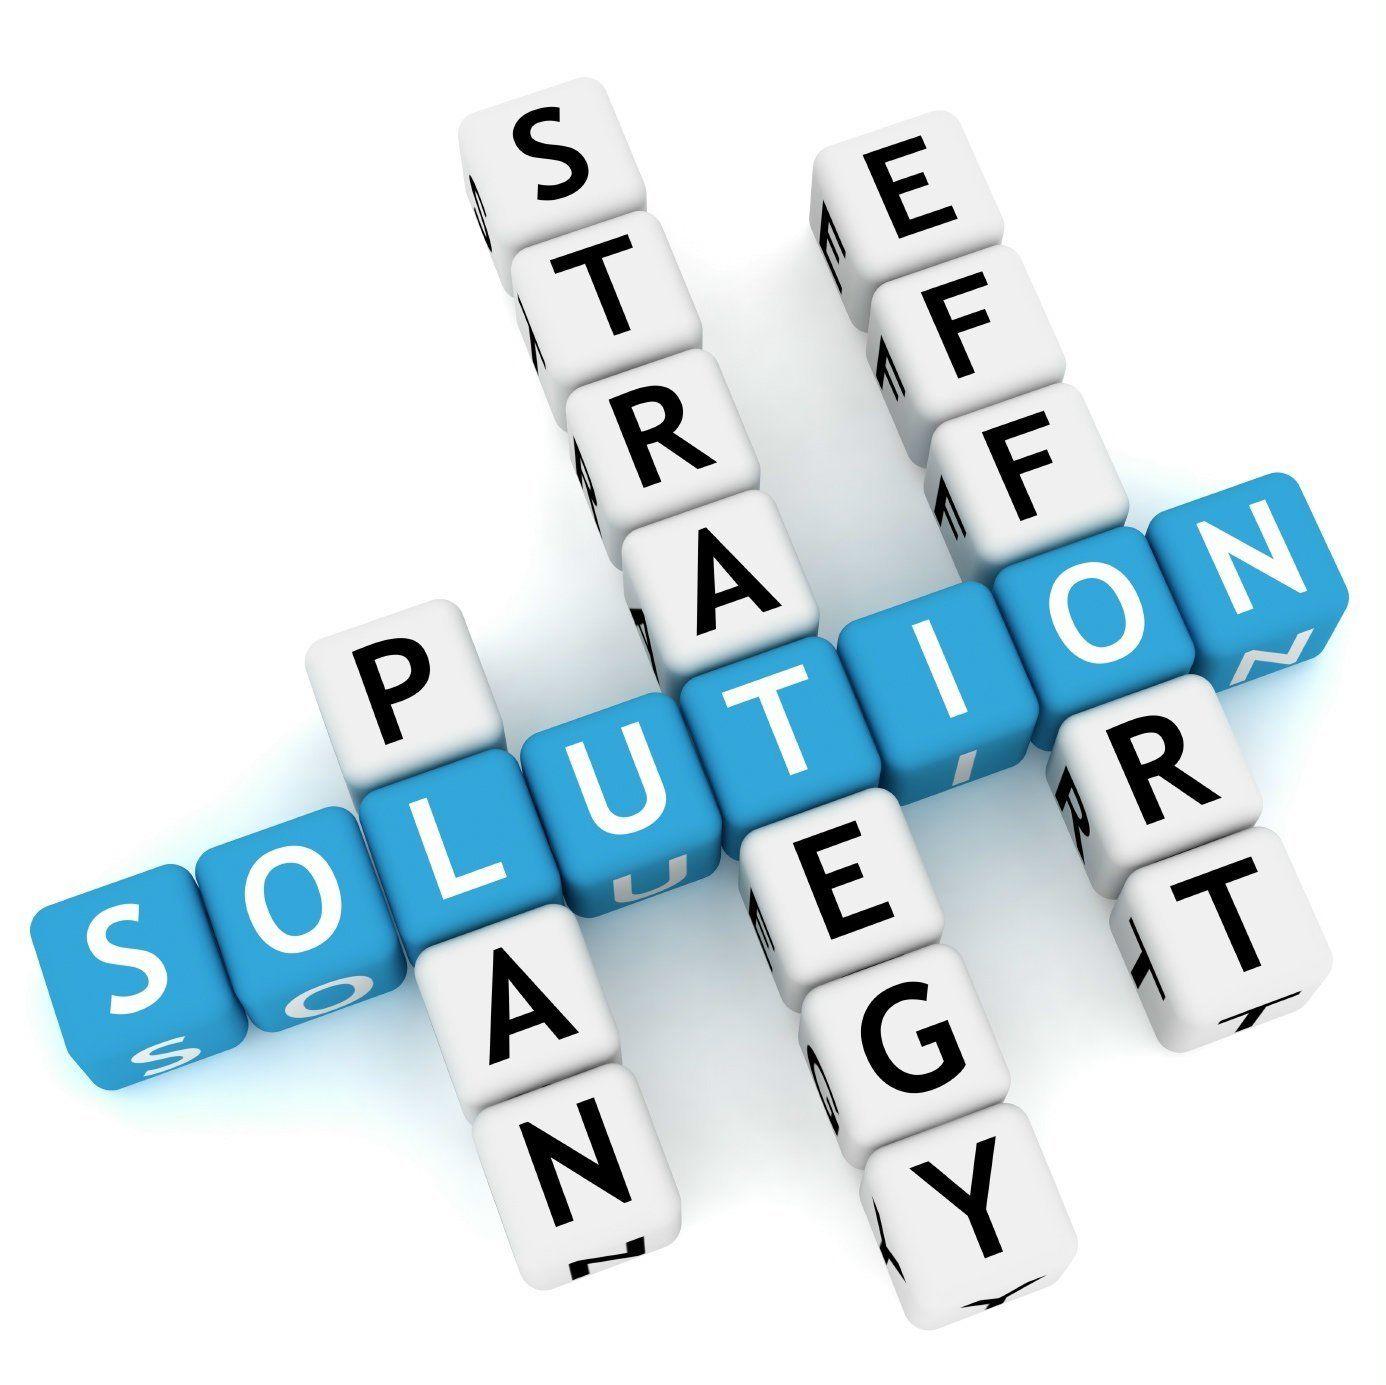 3 Essential Factors Of Business Plans